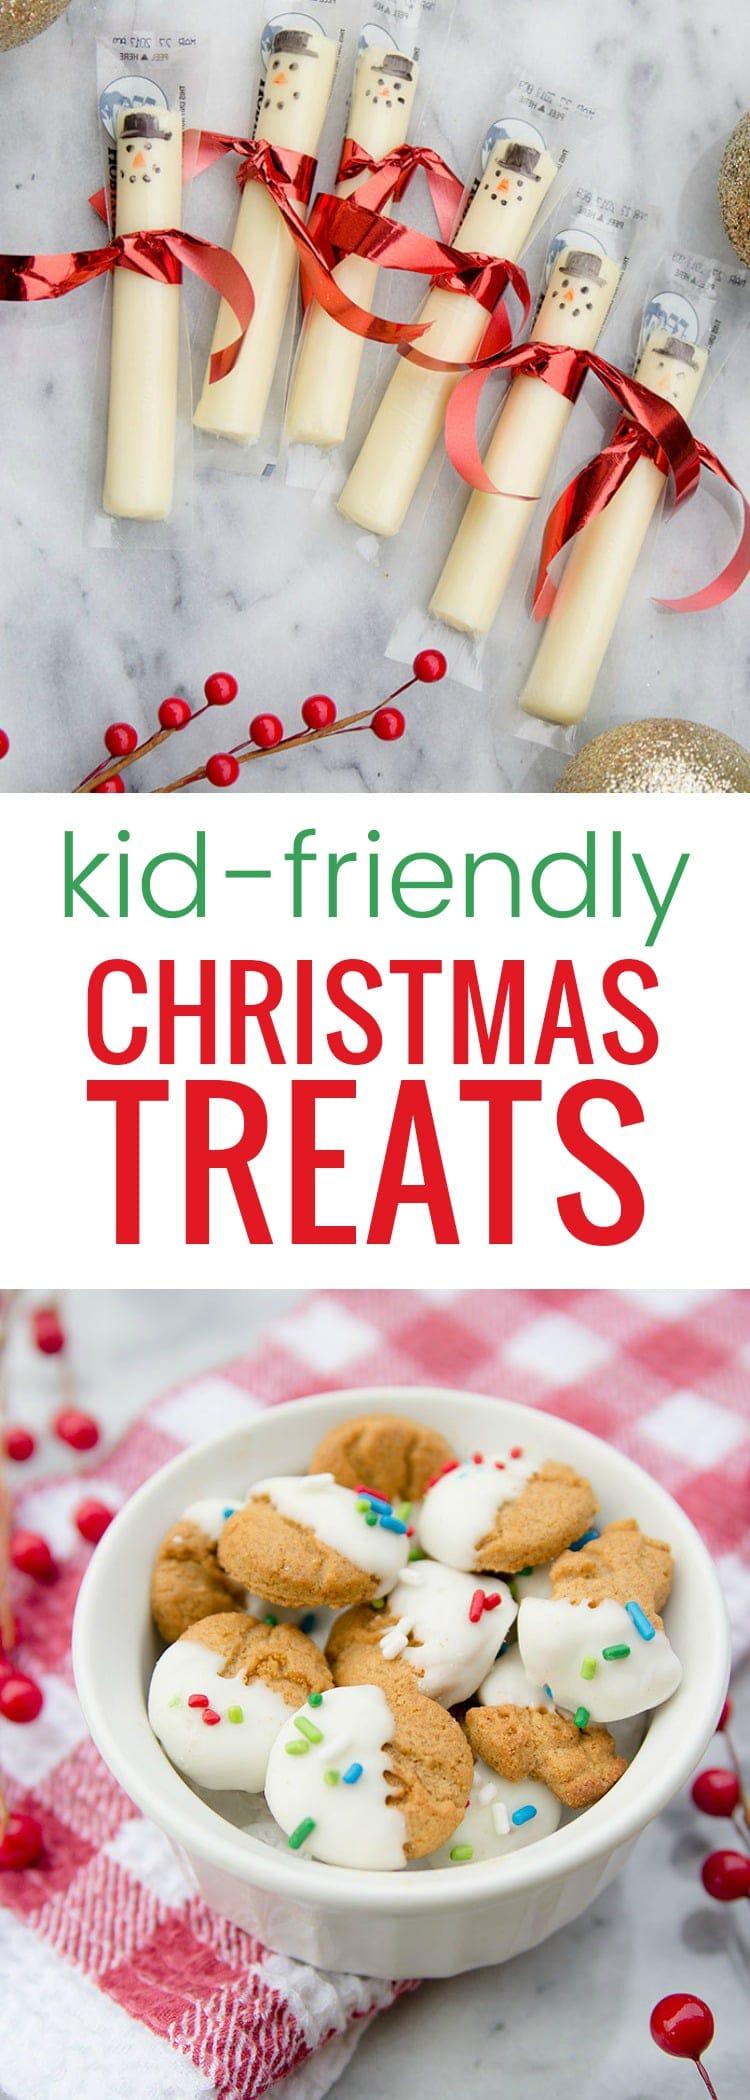 Kid-friendly Christmas treats - so easy and yummy #HorizonOrganic #ad @HorizonOrganic